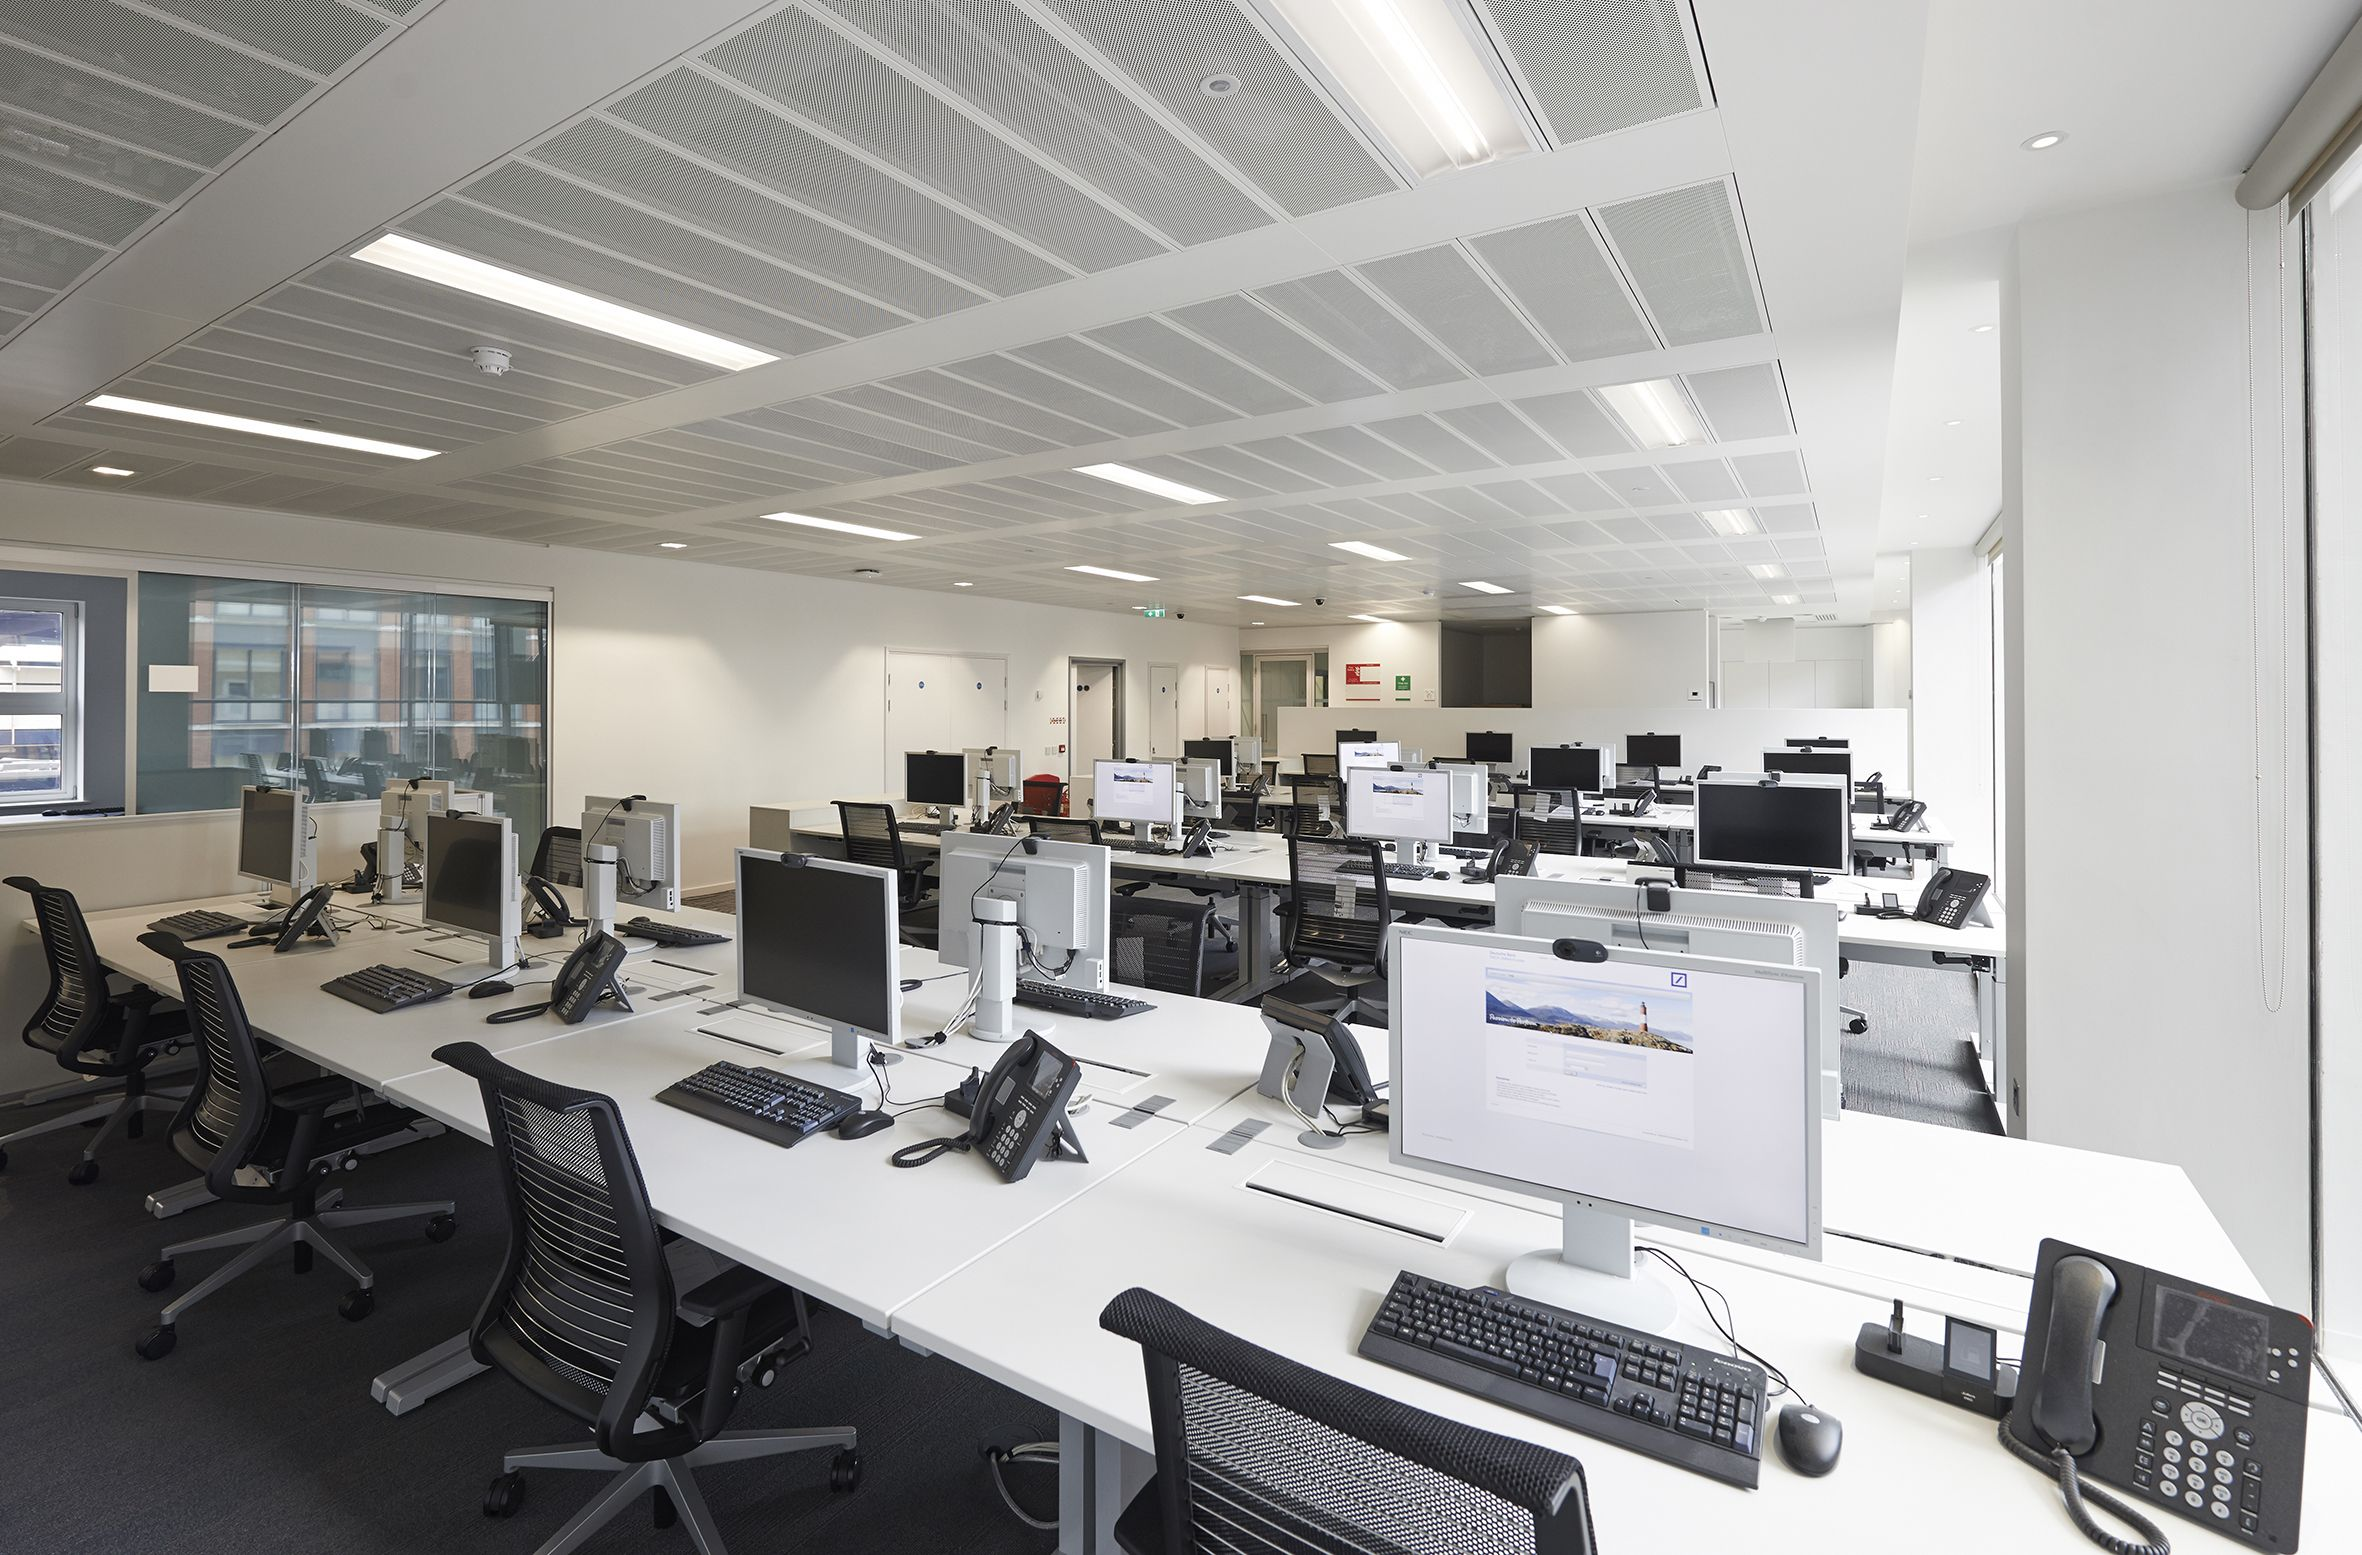 Office lighting at Deutsche Bank head offices. Home